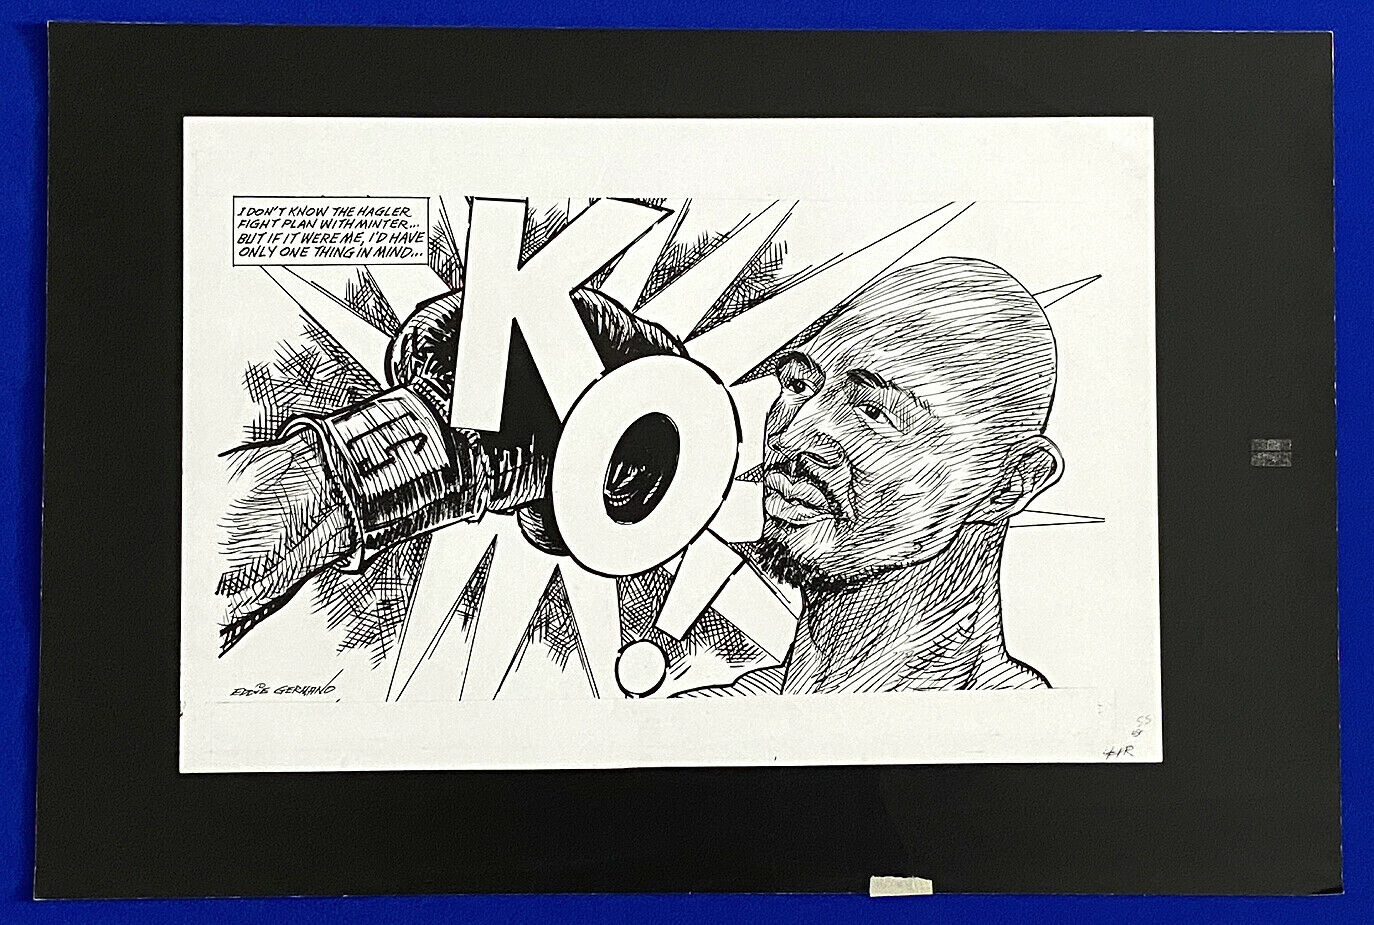 1980 marvin hagler alan minter ko boxing 16x24 original cartoon art by germano